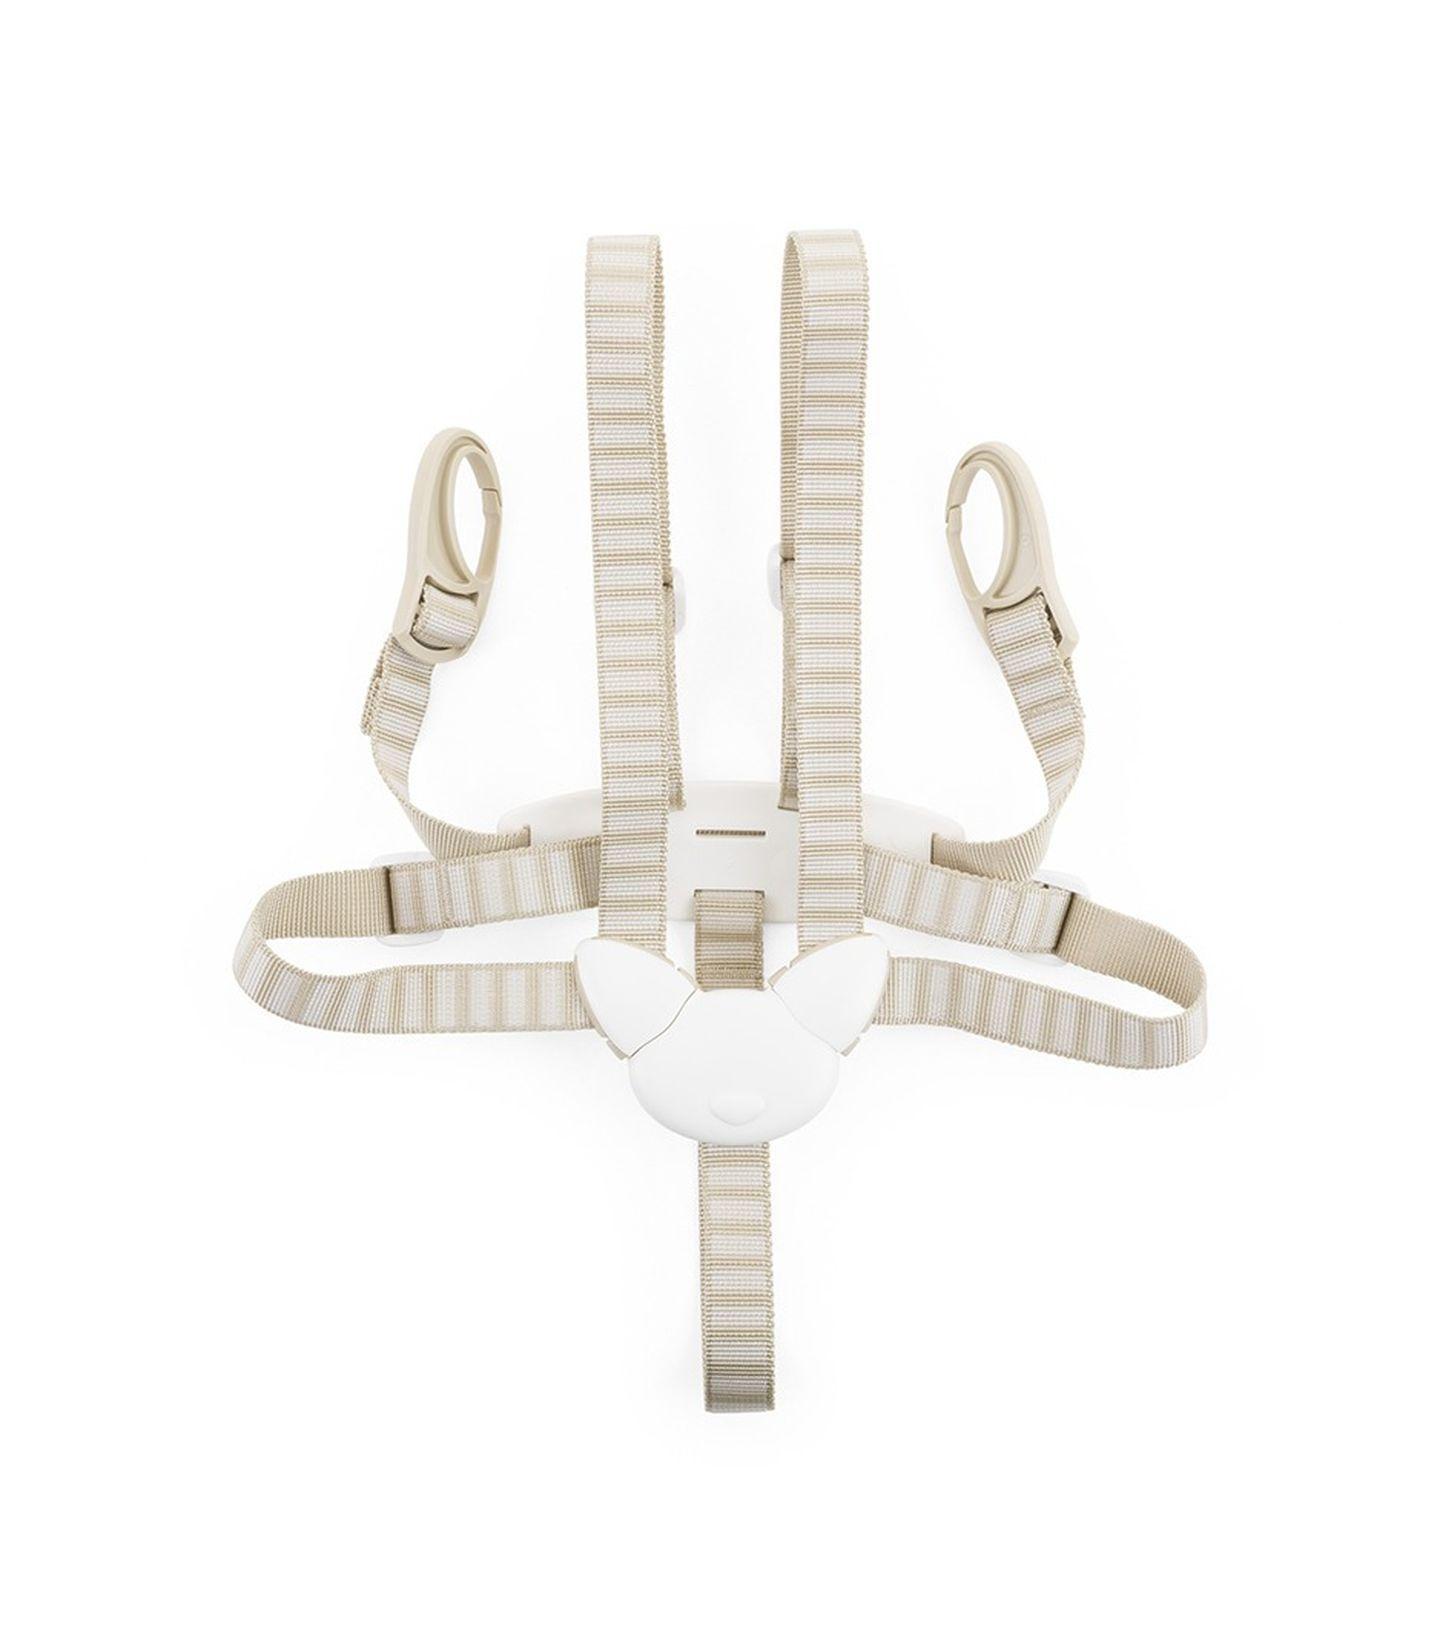 Ремни безопасности Harness 5-точечные для стульчика Stokke Tripp Trapp